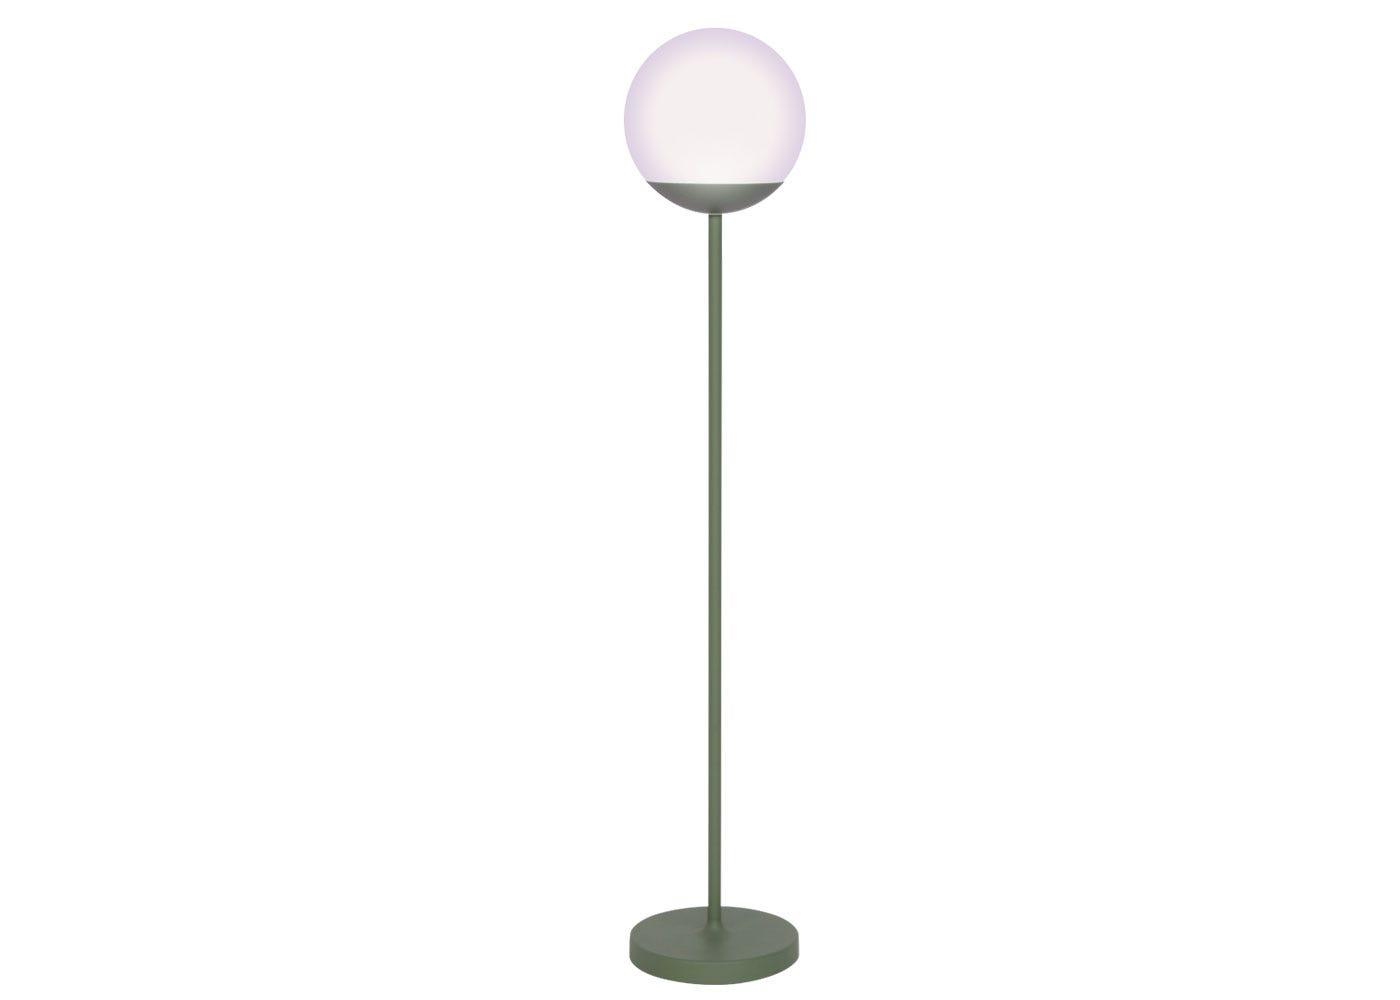 As shown: Mooon outdoor floor lamp in cactus finish.